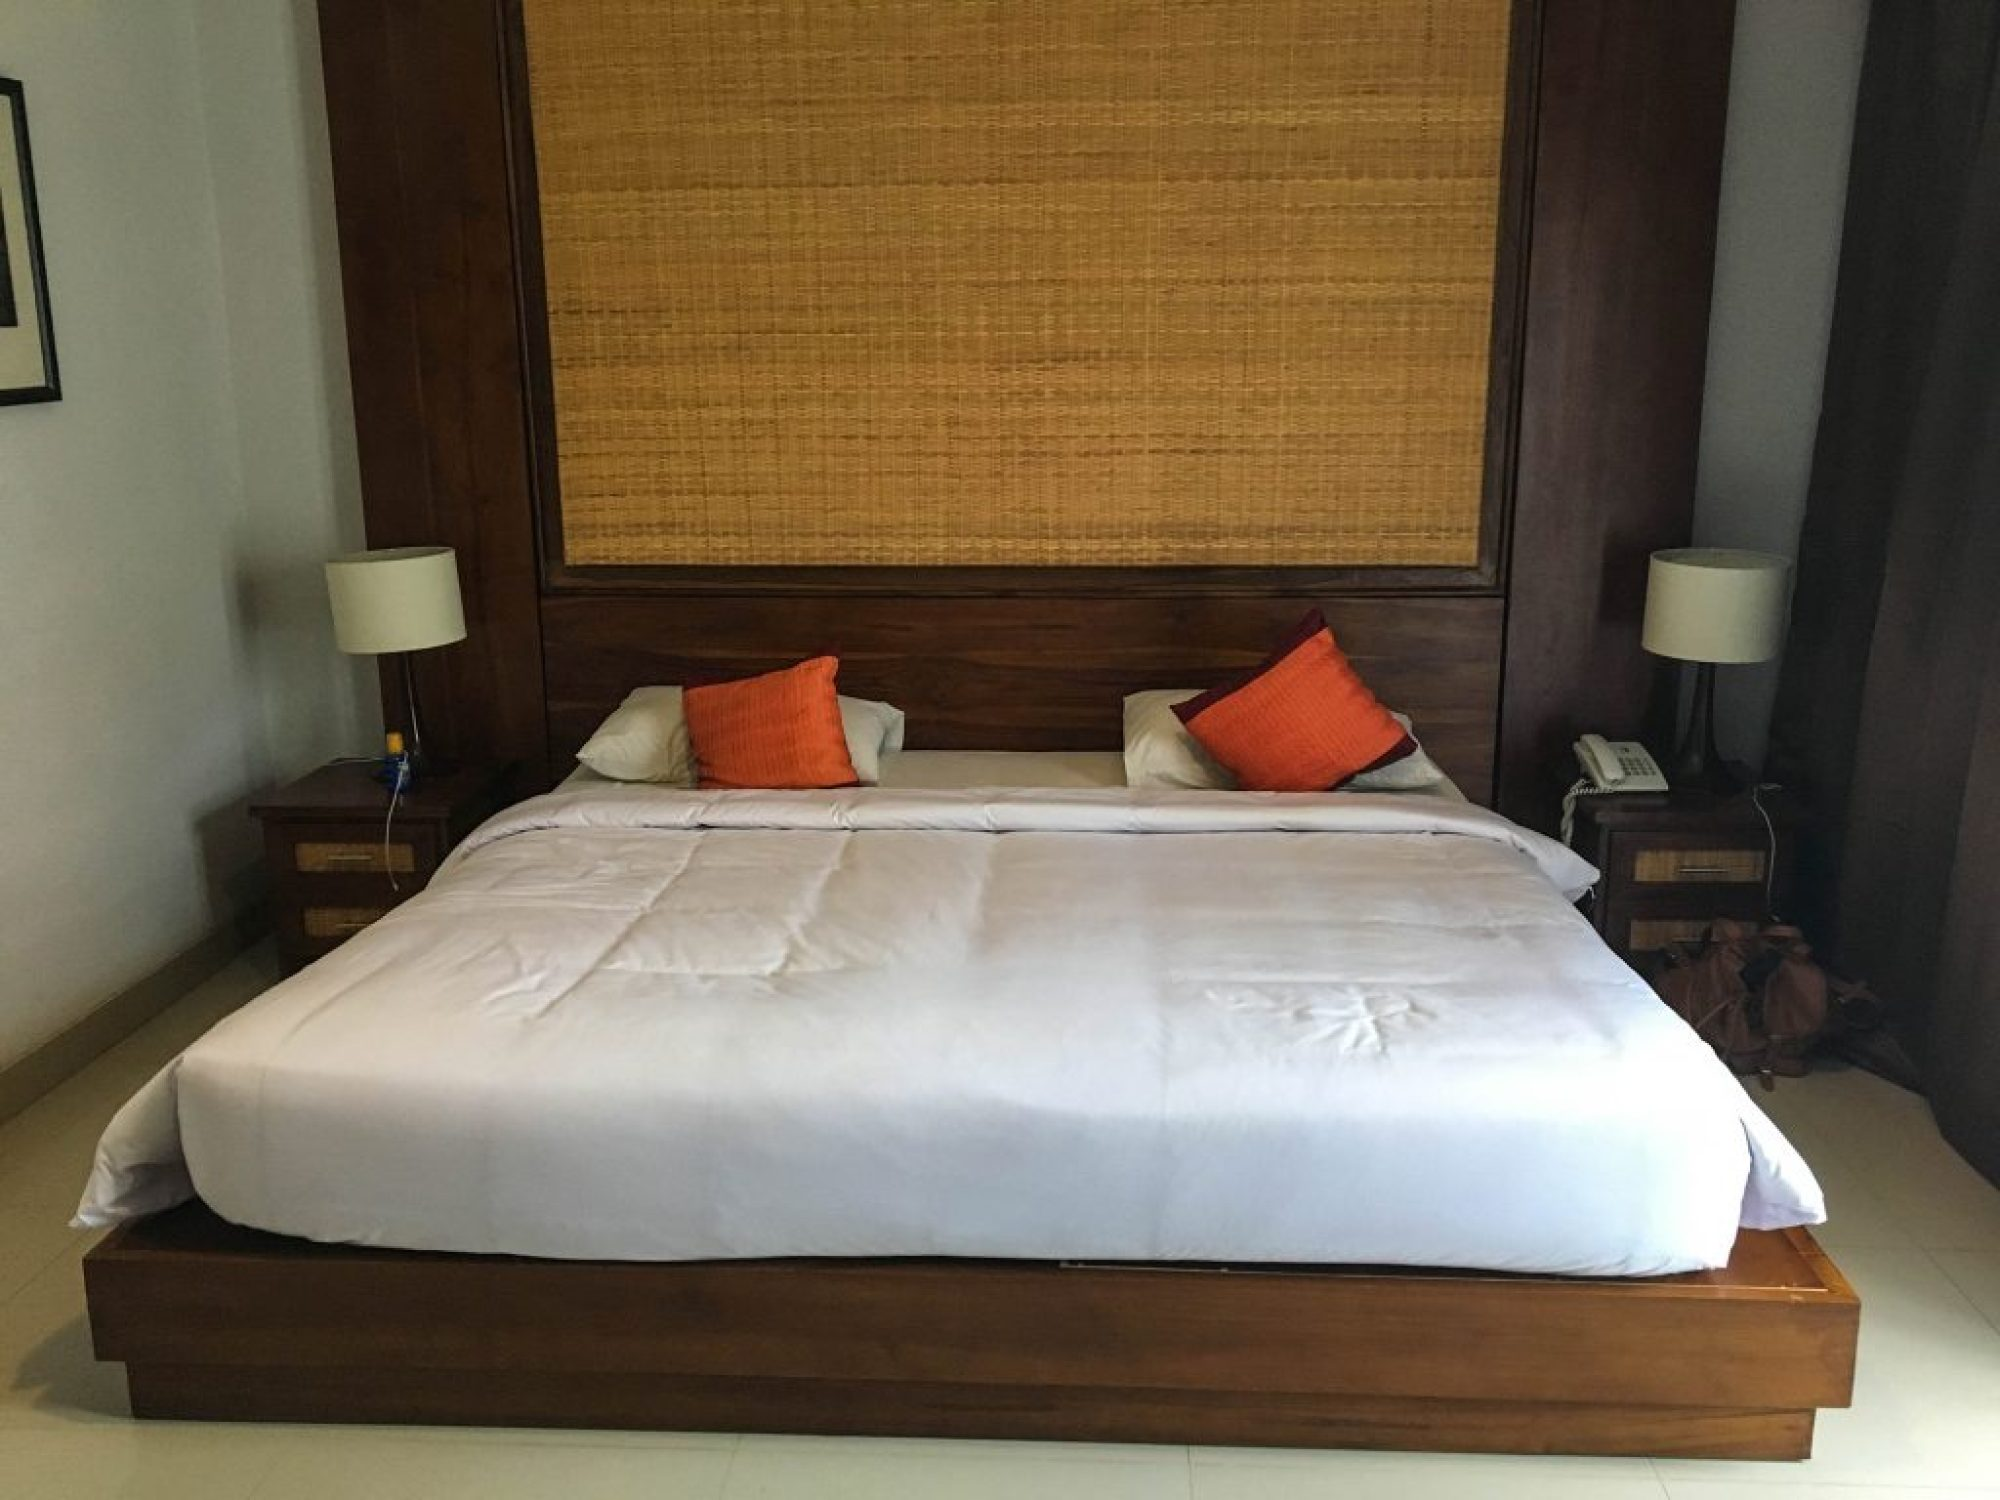 Preparativos de viaje a Indonesia-14